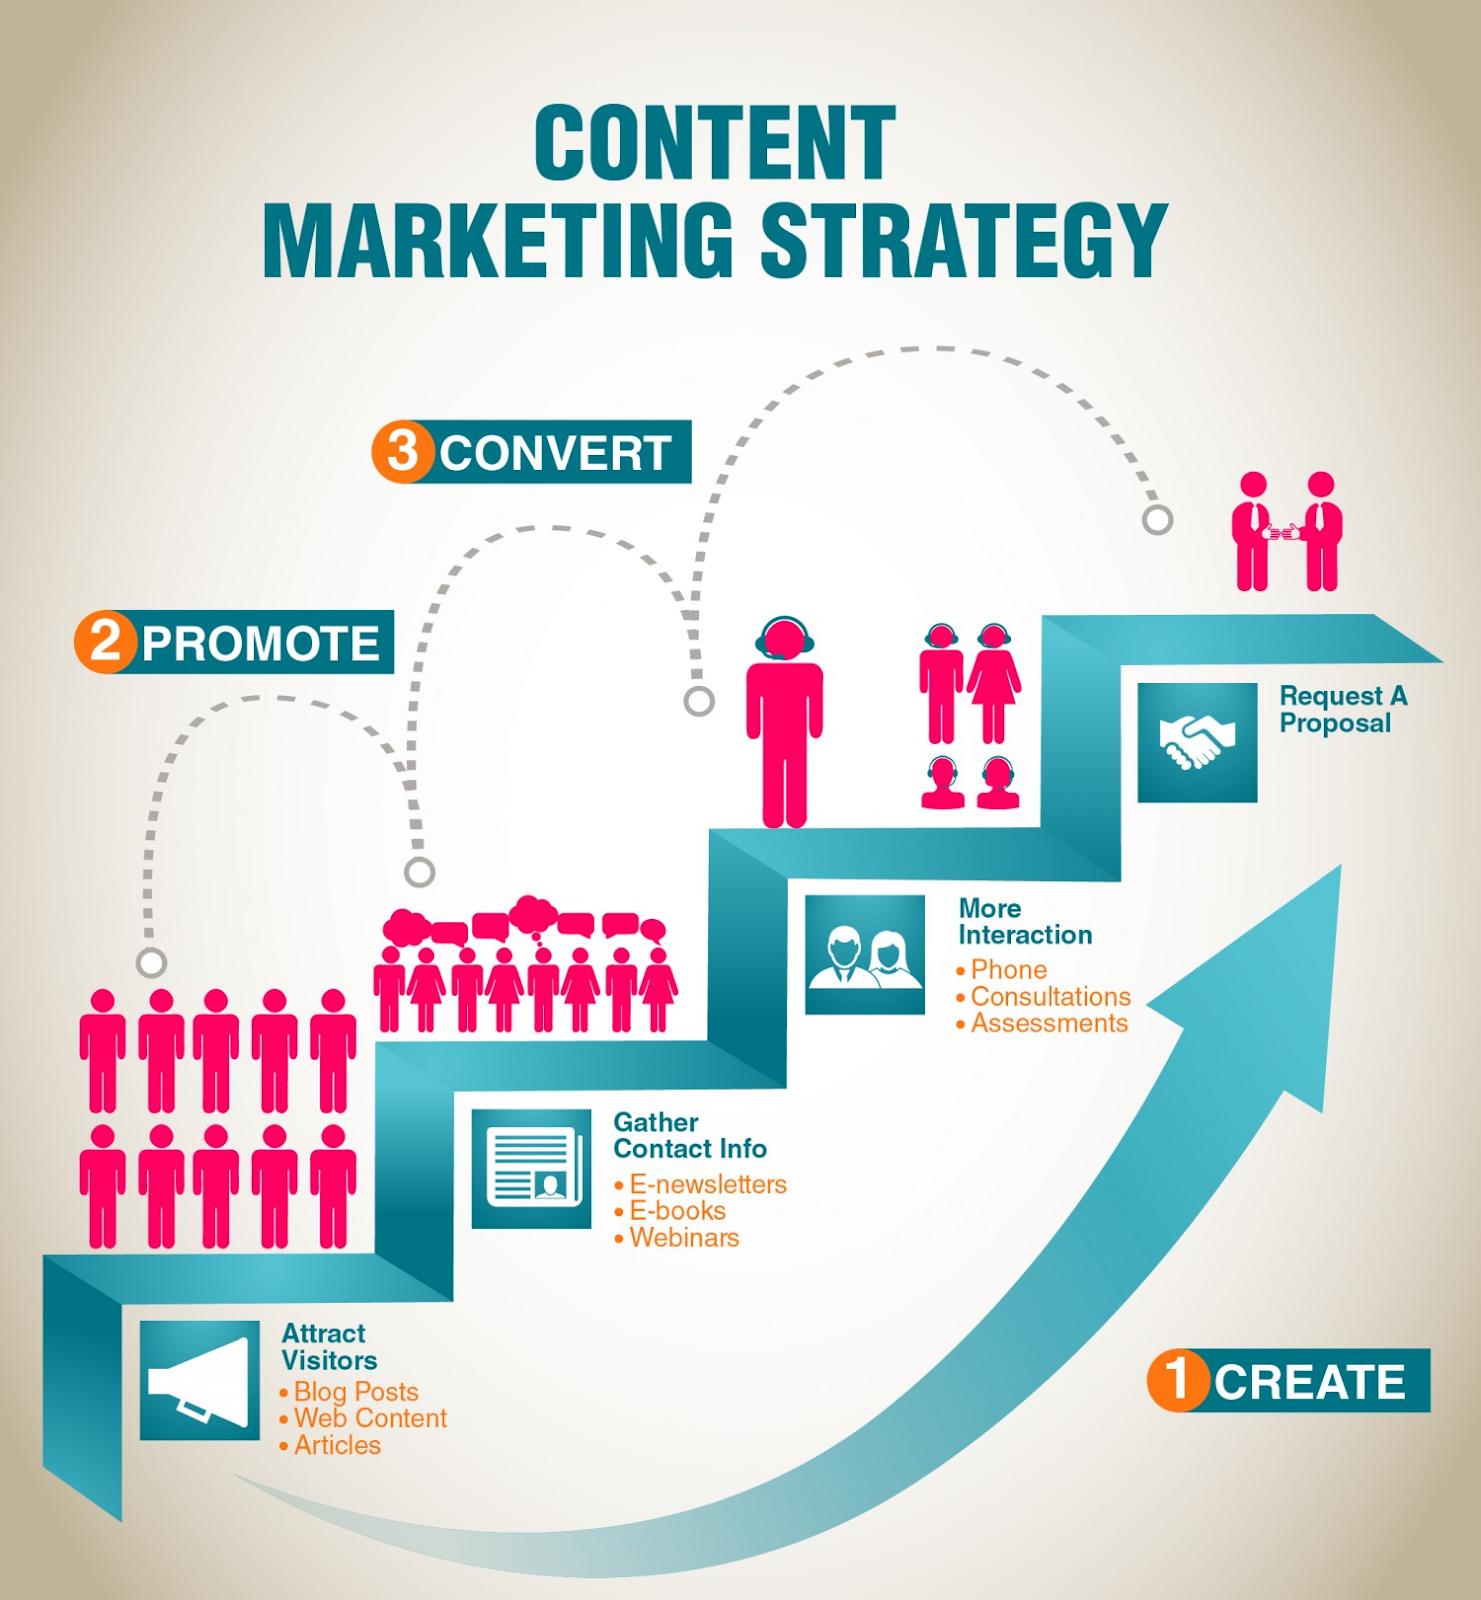 Content marketing roadmap to conversion